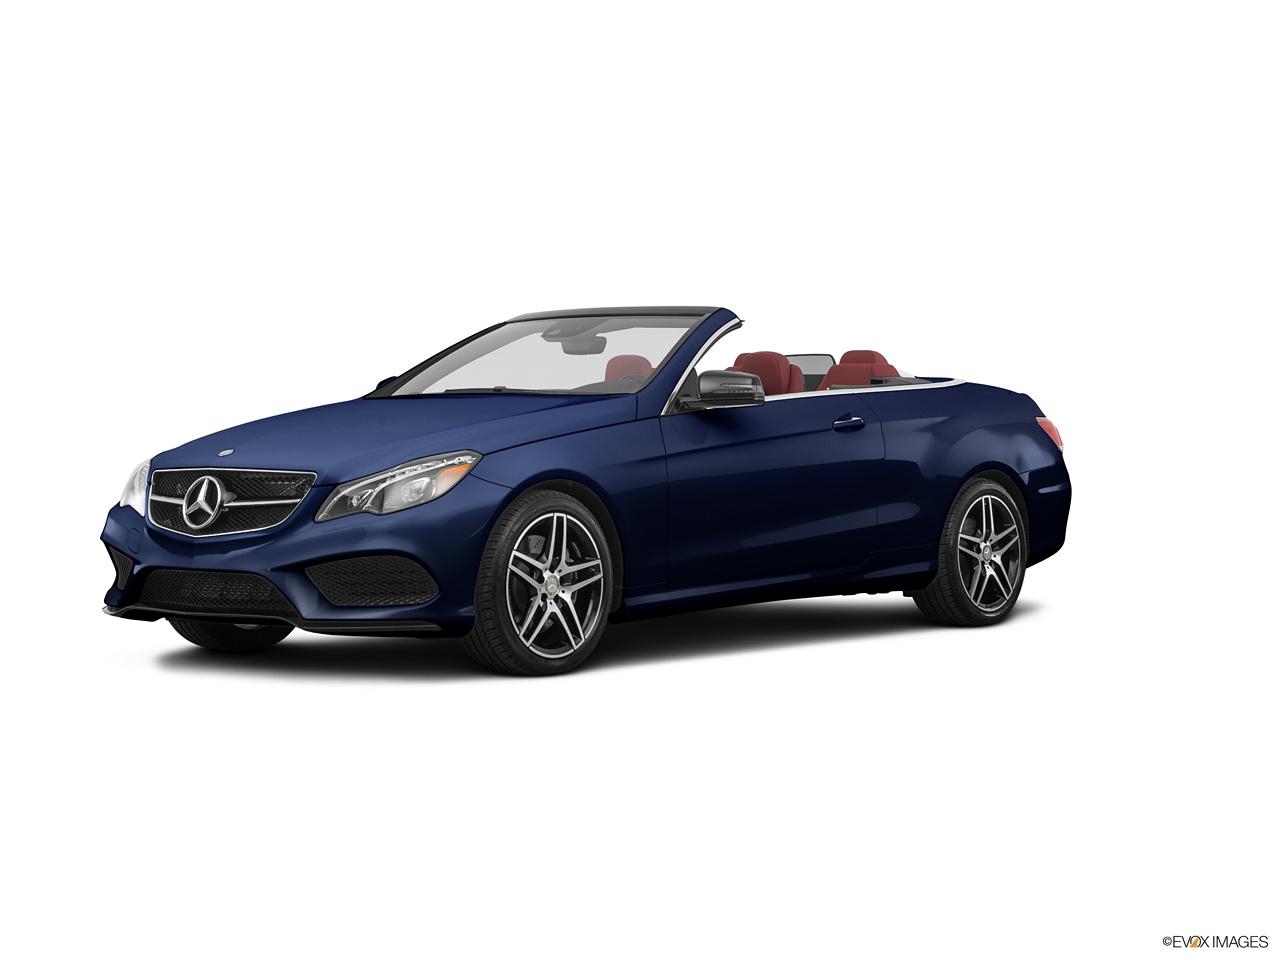 Car pictures list for mercedes benz e class cabriolet 2016 for 2016 mercedes benz e class convertible